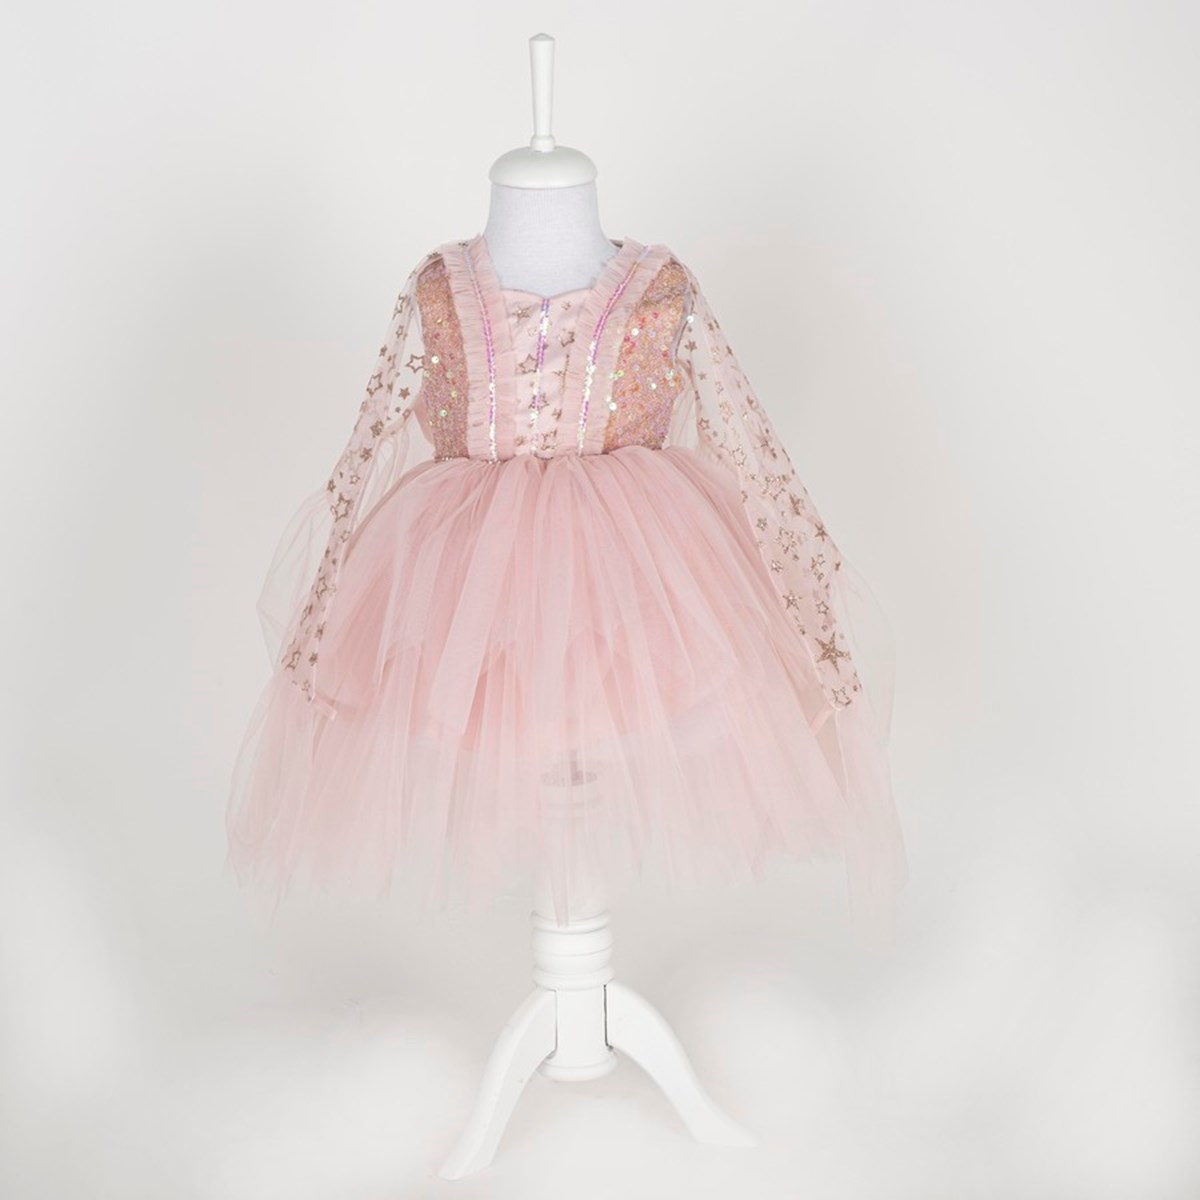 9360 Pelerinli Elbise 1